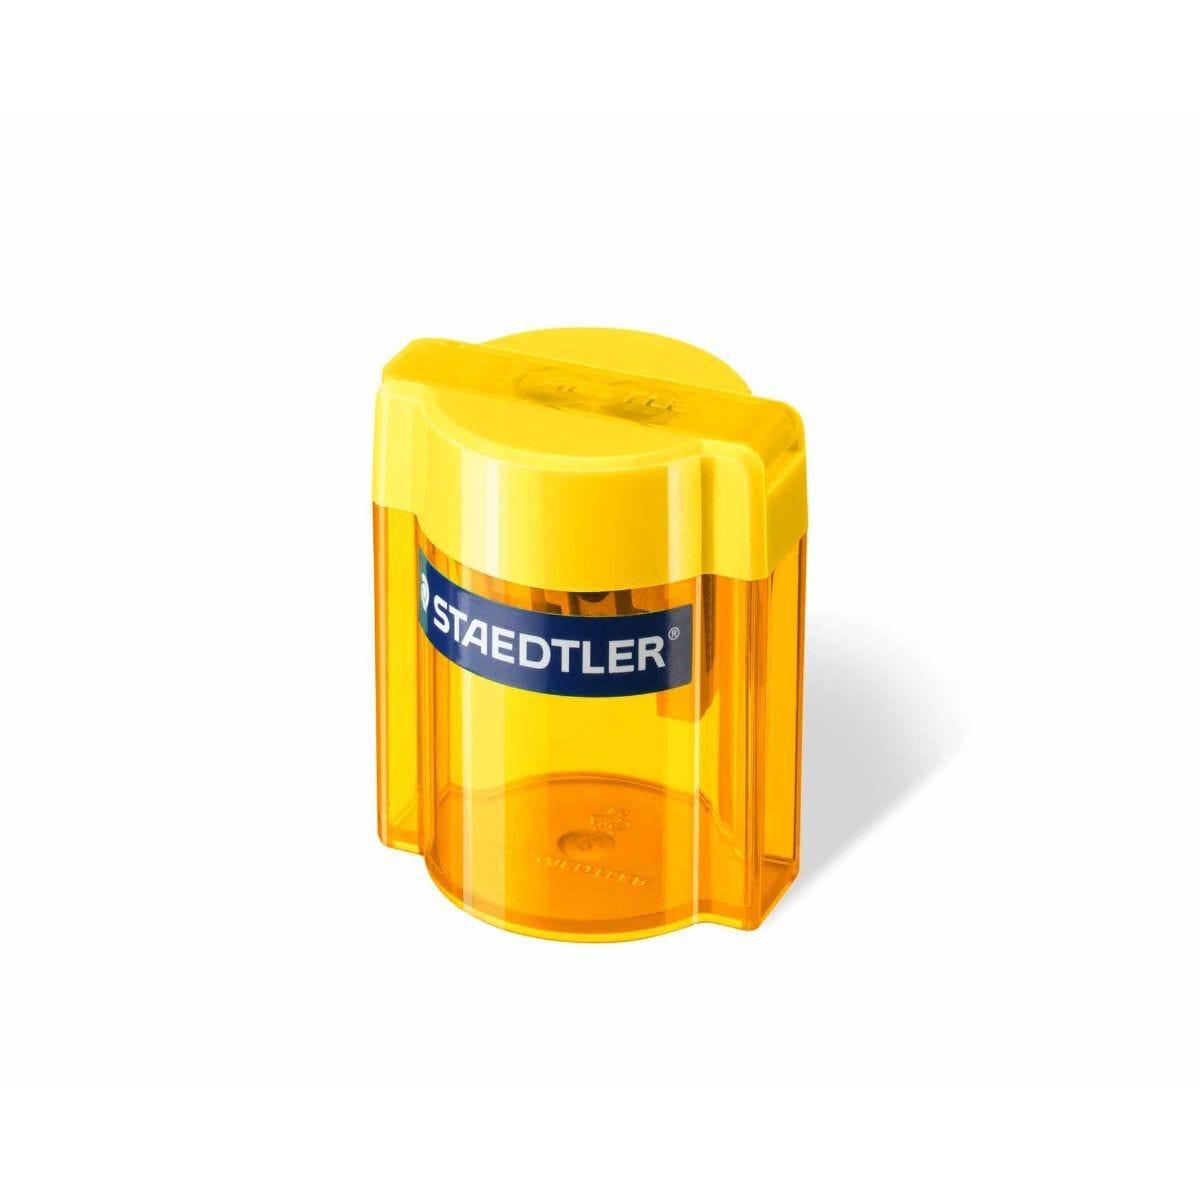 Staedtler Jumbo Canister Pencil Sharpener Assorted